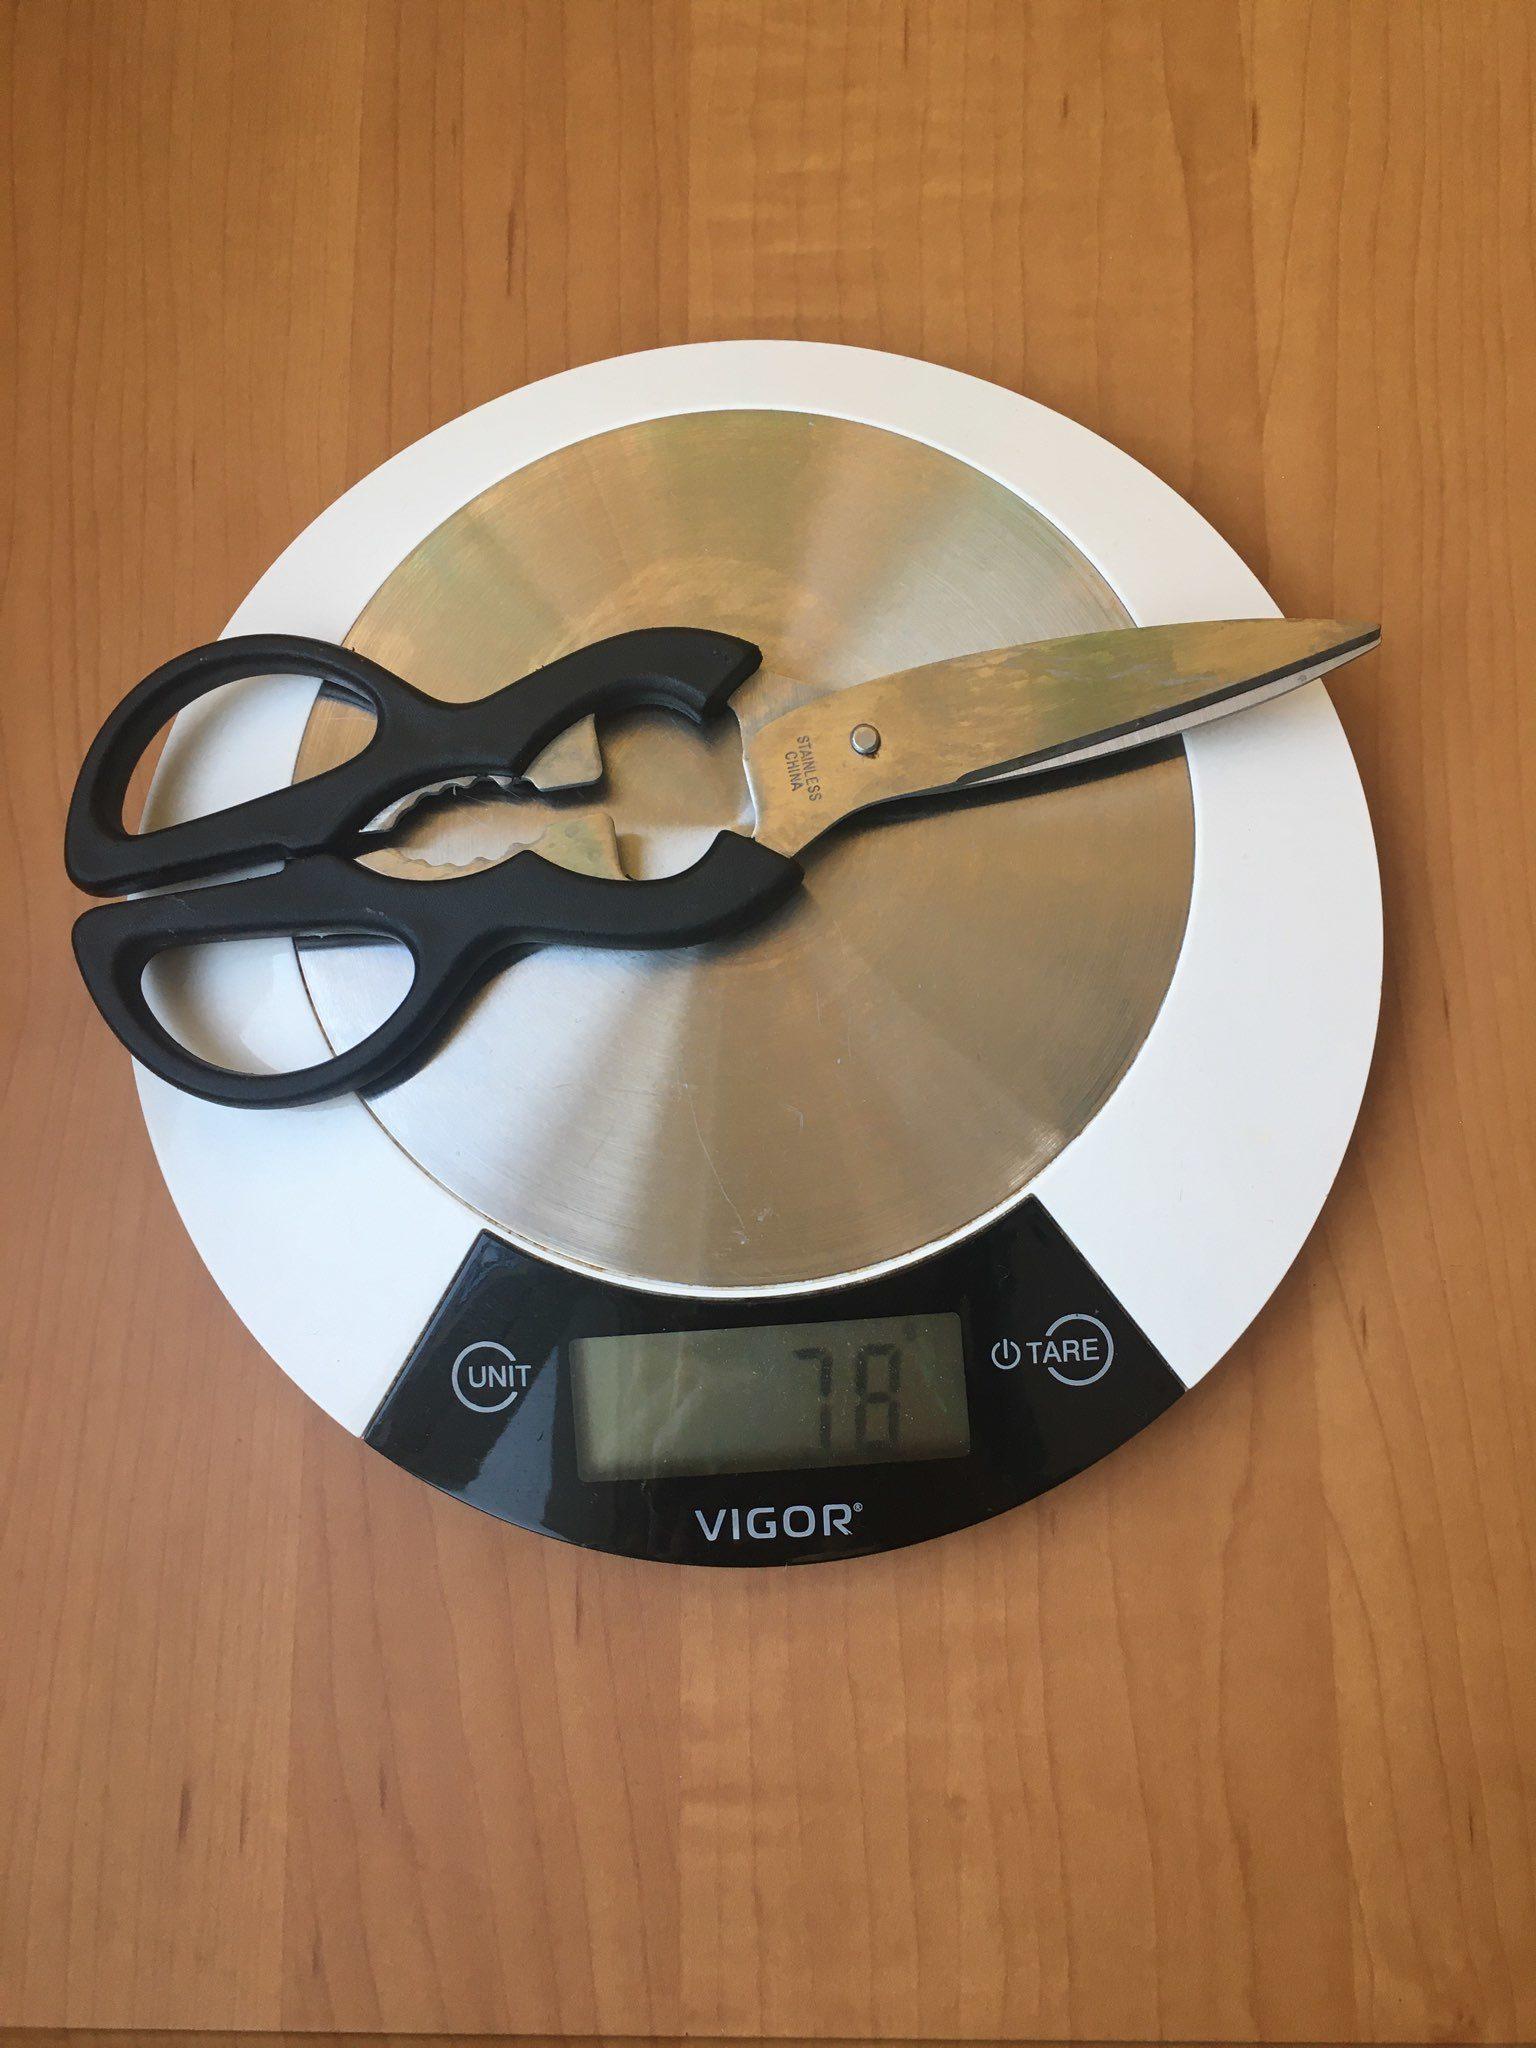 вес ножниц кухонных